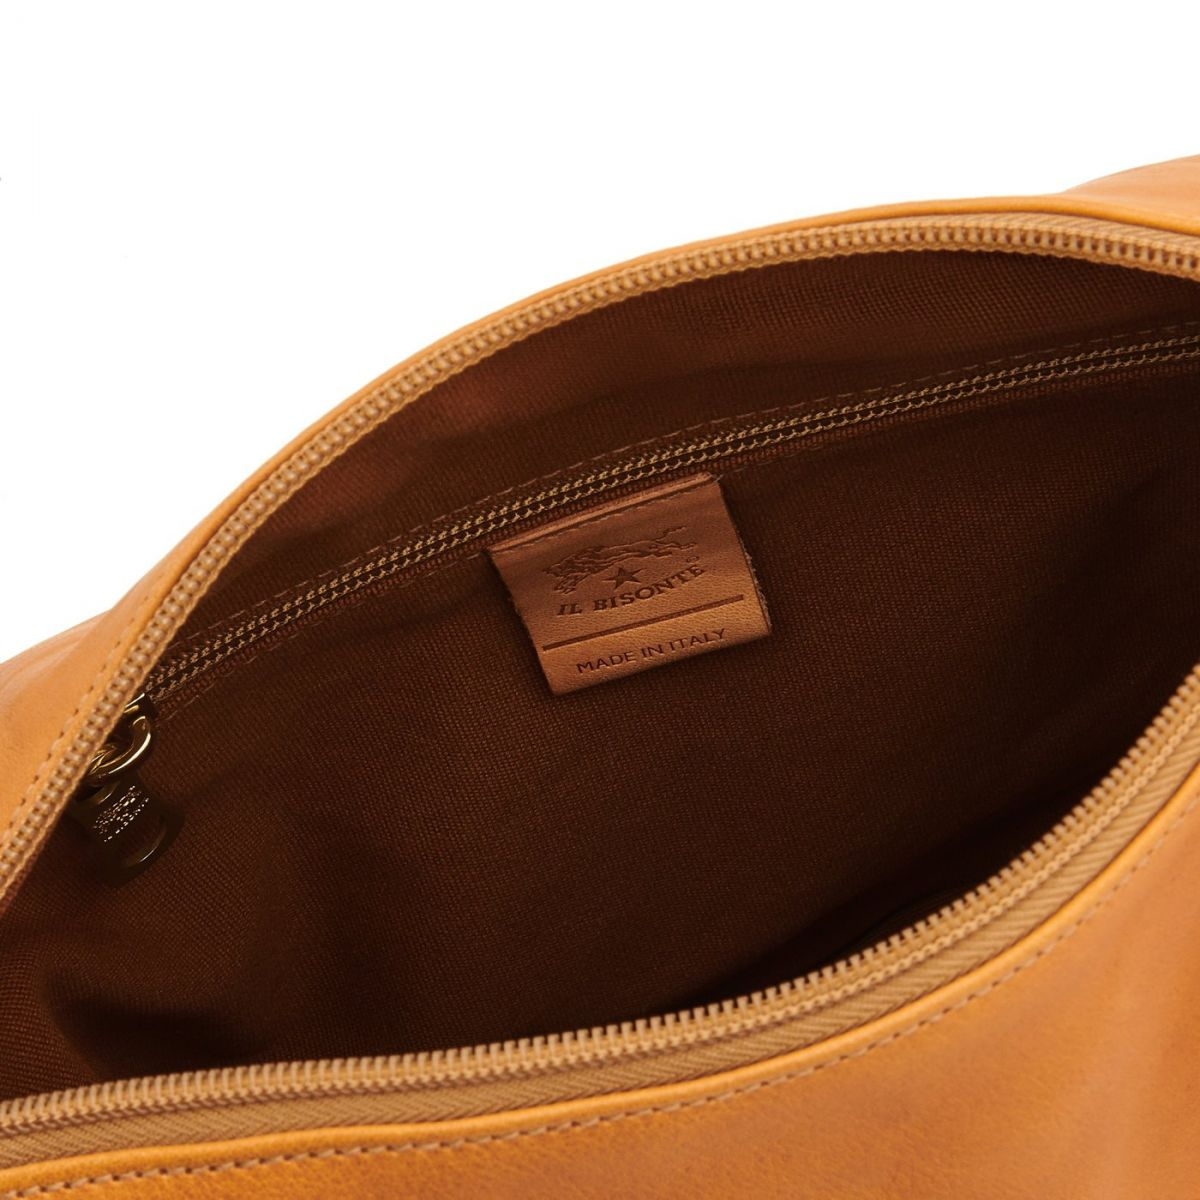 Women's Crossbody Bag in Vintage Cowhide Leather BCR012 color Natural | Details